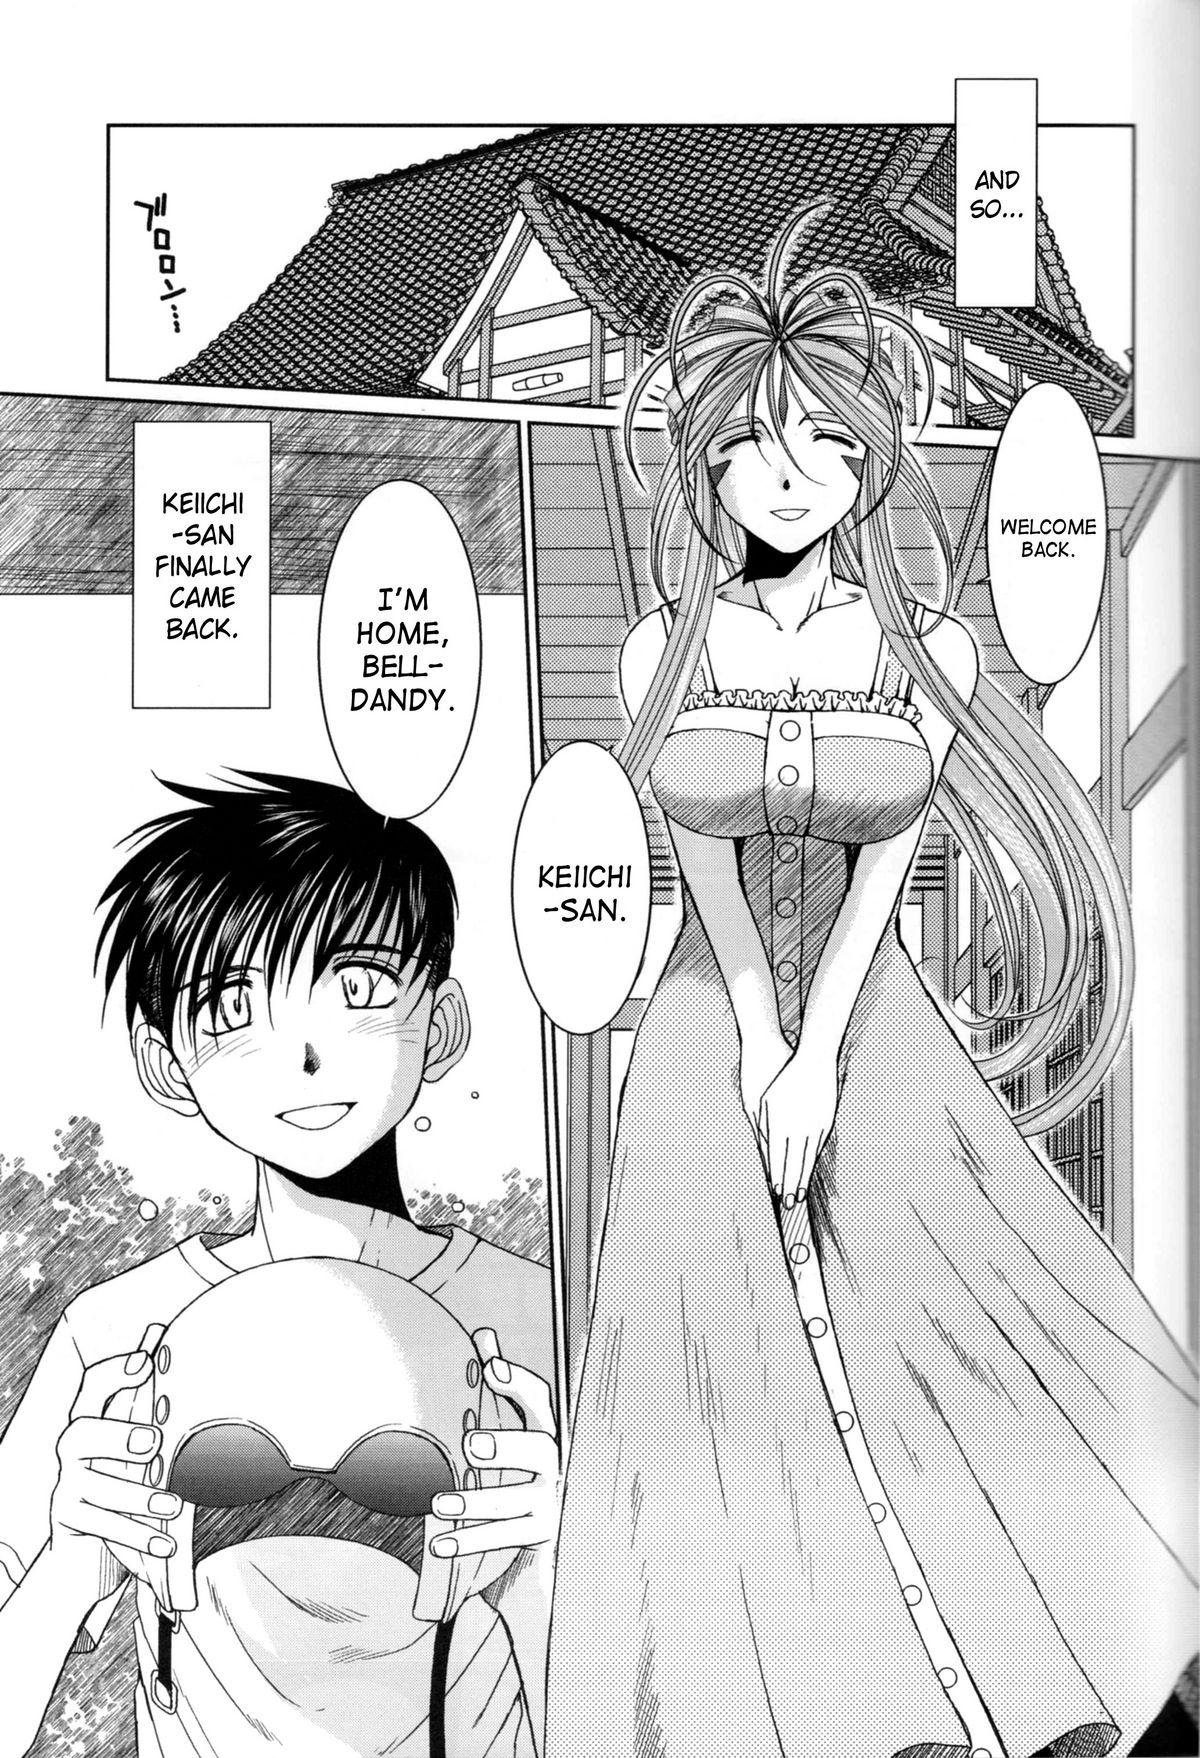 (C63) [CIRCLE OUTERWORLD (Chiba Shuusaku)] Midgard  (Ah! My Goddess) complete [eng] 412